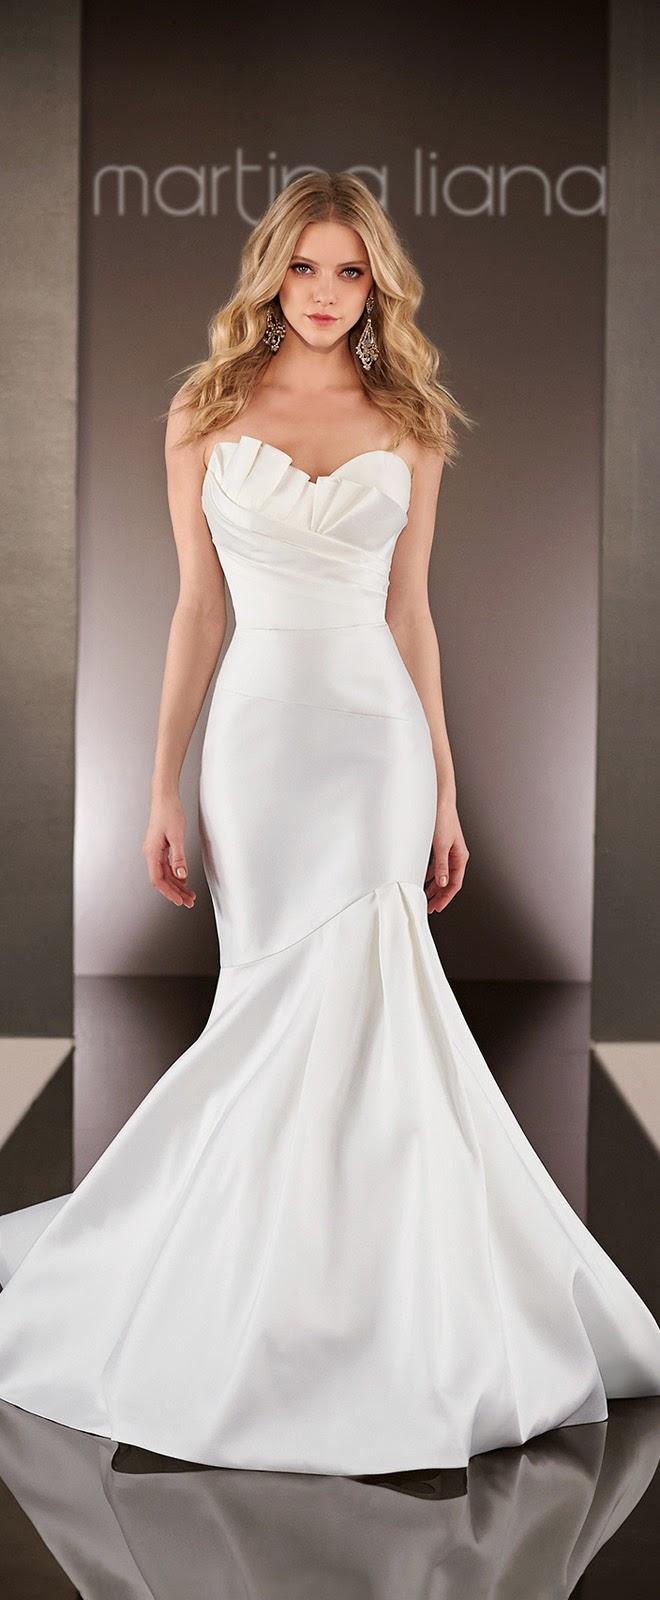 Mexican Style Wedding Dress 94 Fancy Please contact Martina Liana